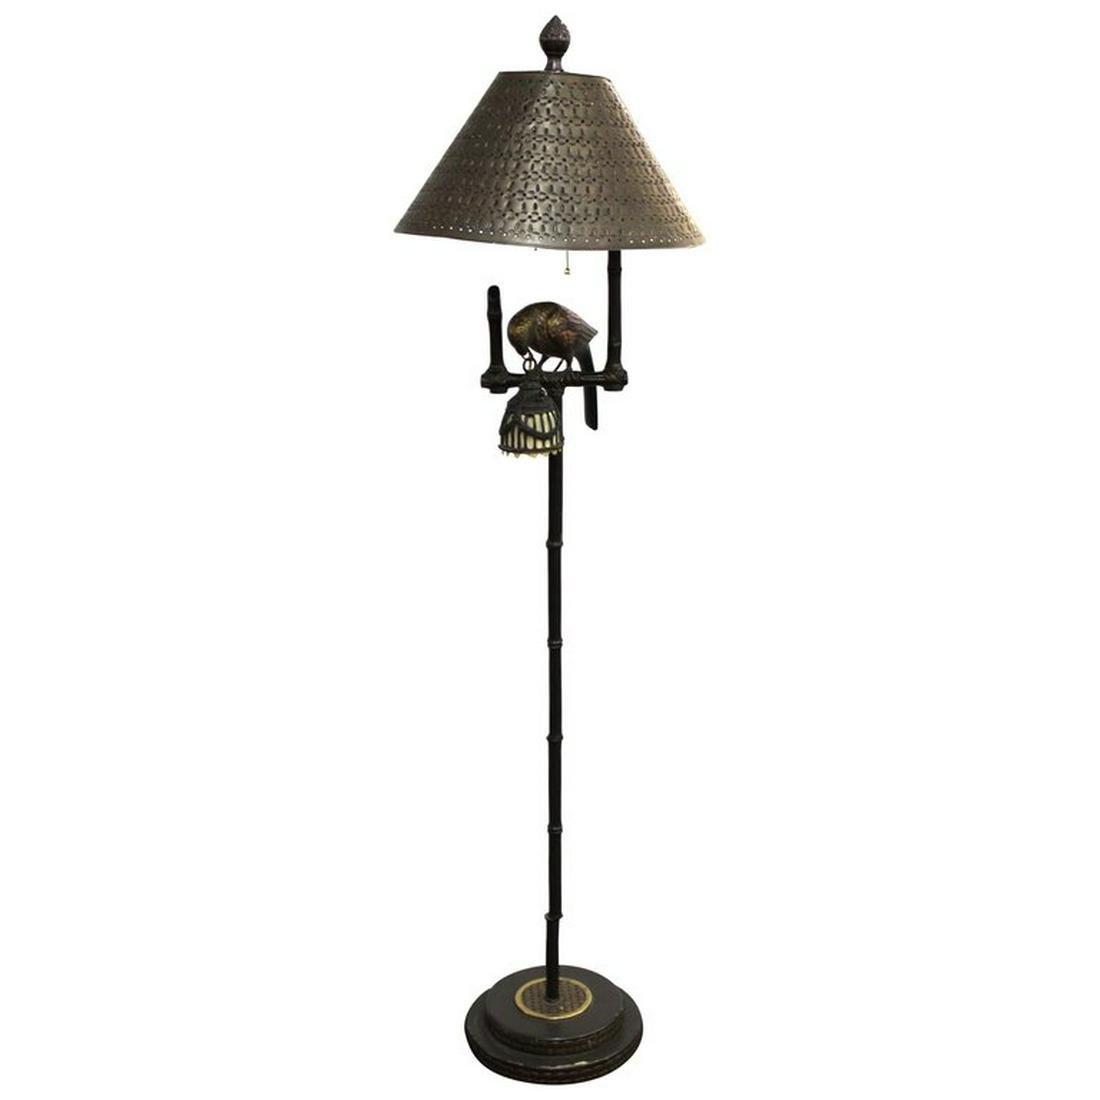 Maitland Smith Bronze Floor Lamp w Parrot